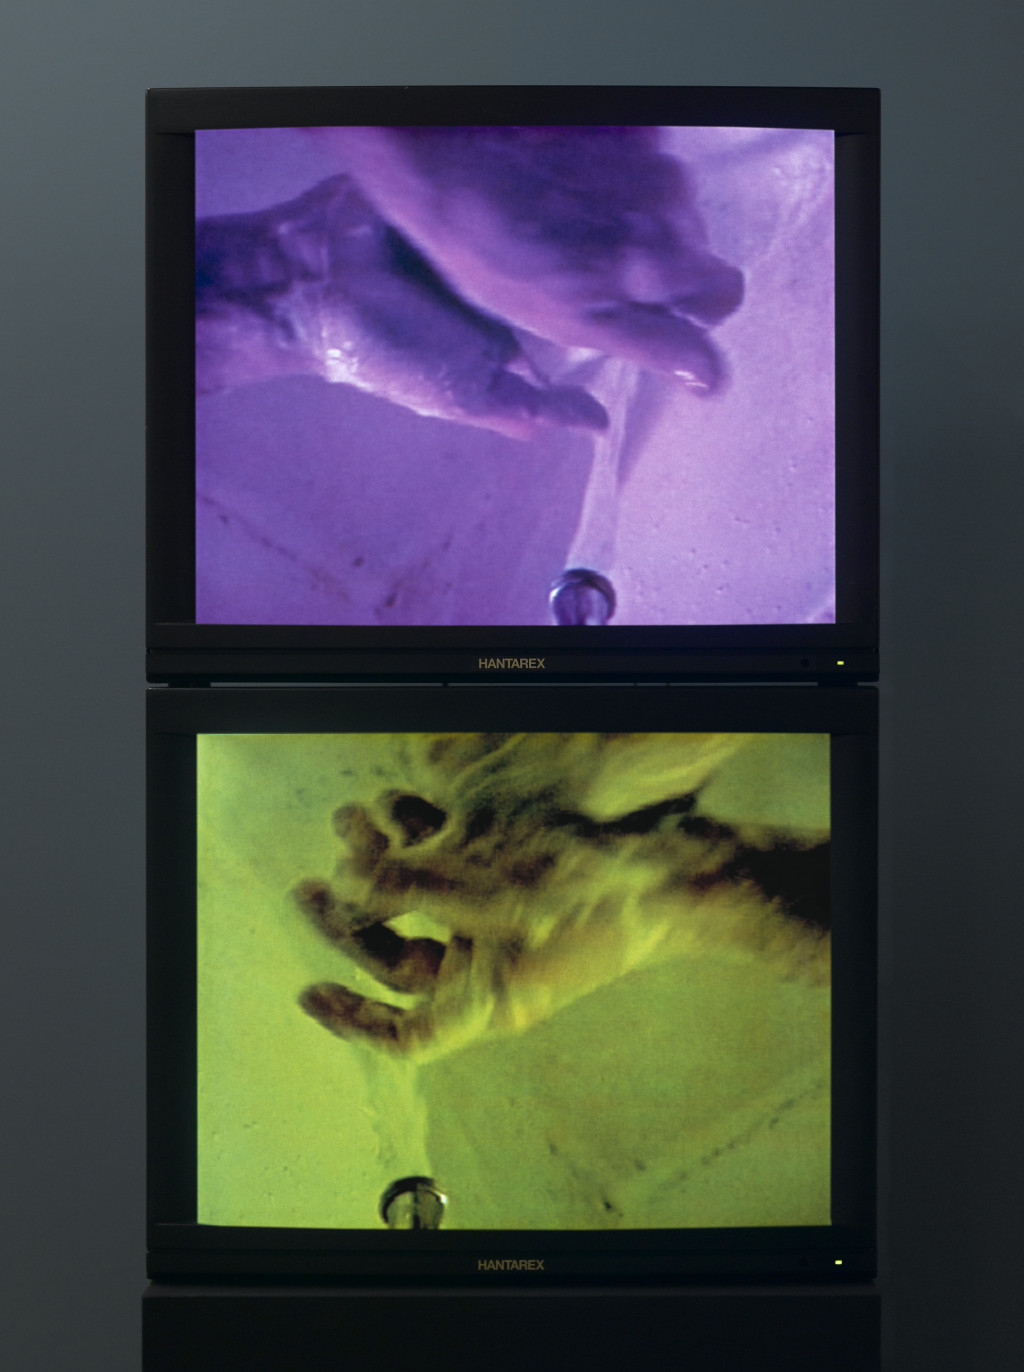 Bruce Nauman, 'Washing Hands Abnormal', 1996. Collection Stedelijk Museum Amsterdam.